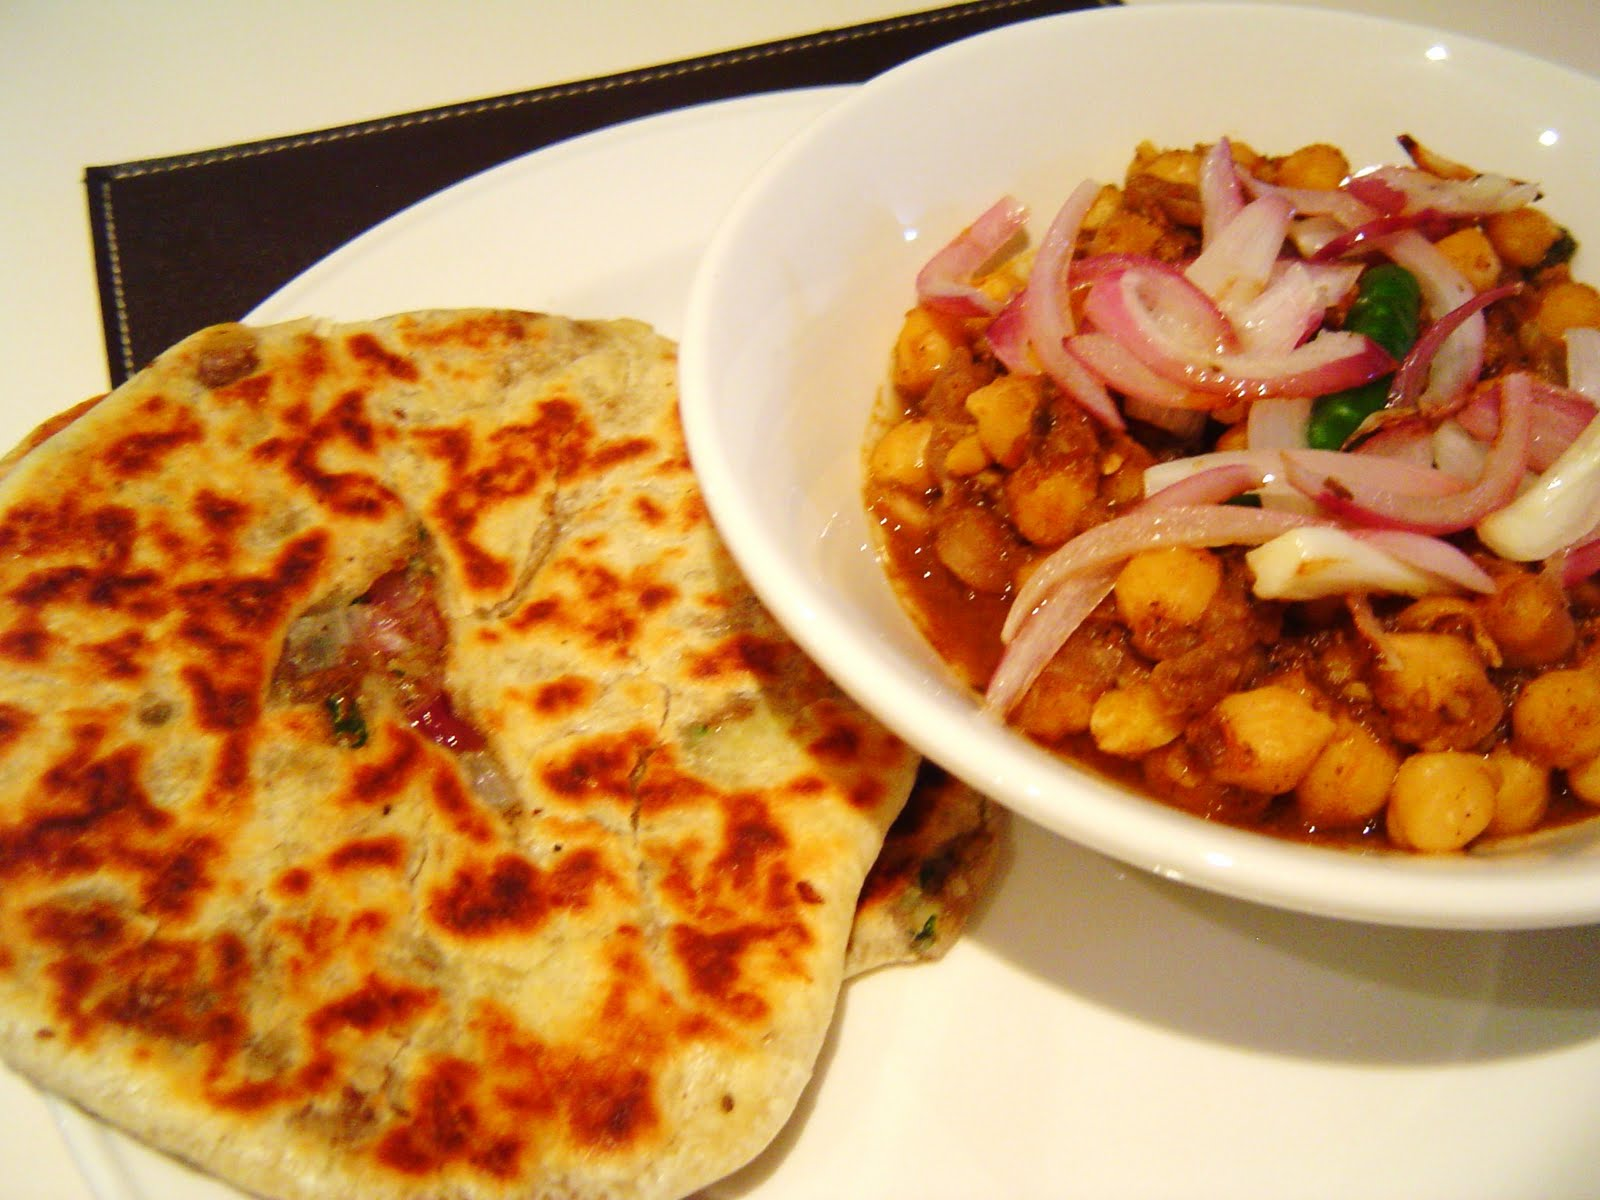 Payal 39 s cafe aaloo kulcha and chana masala for Amritsari cuisine